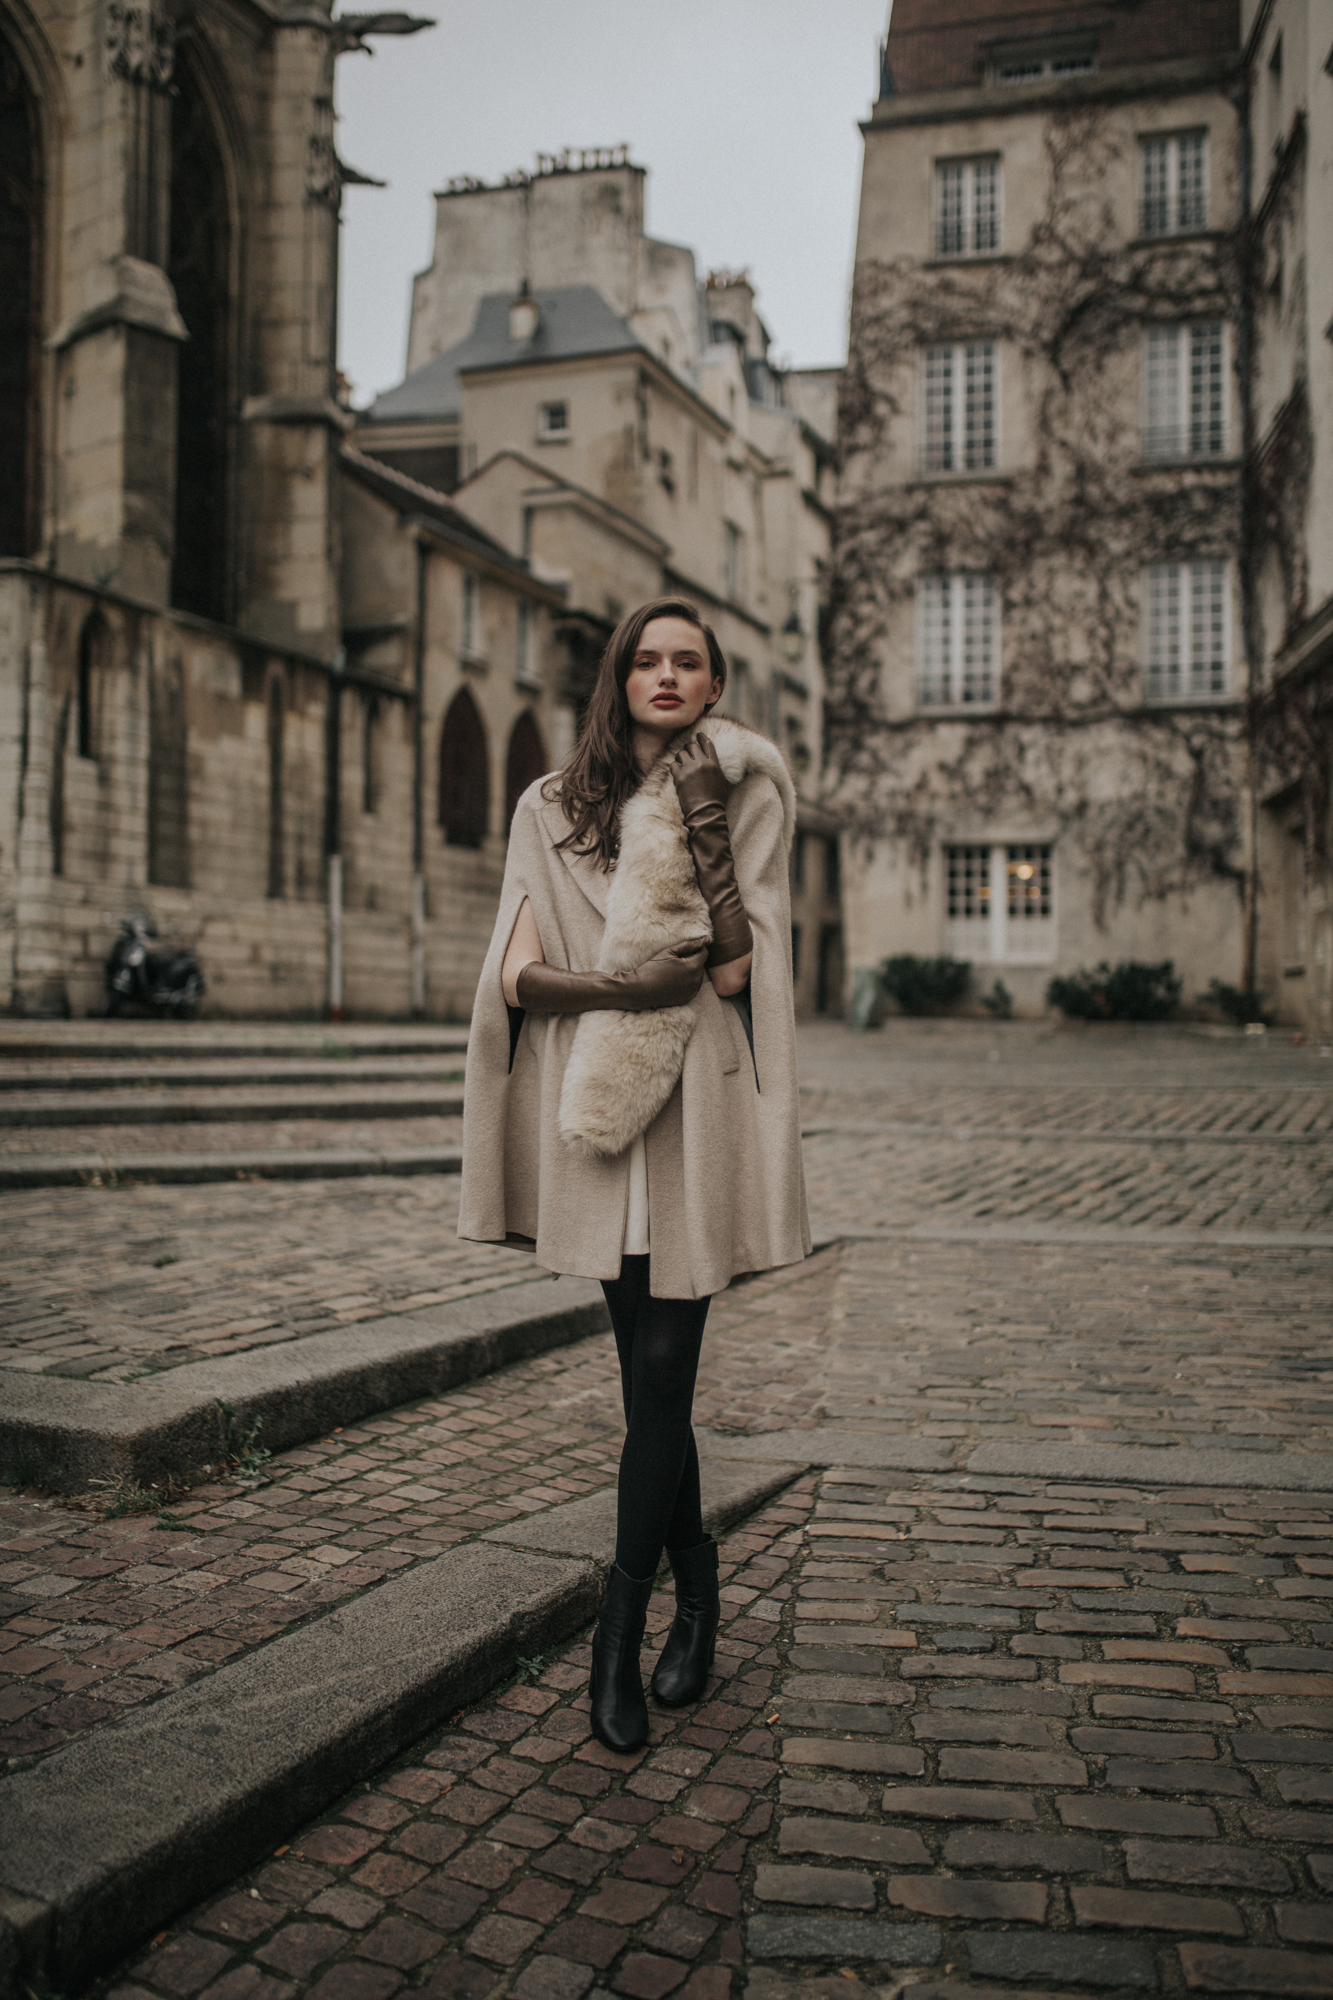 Maria_Traynor_Paris2017_12_01_062319-_CMB.jpg